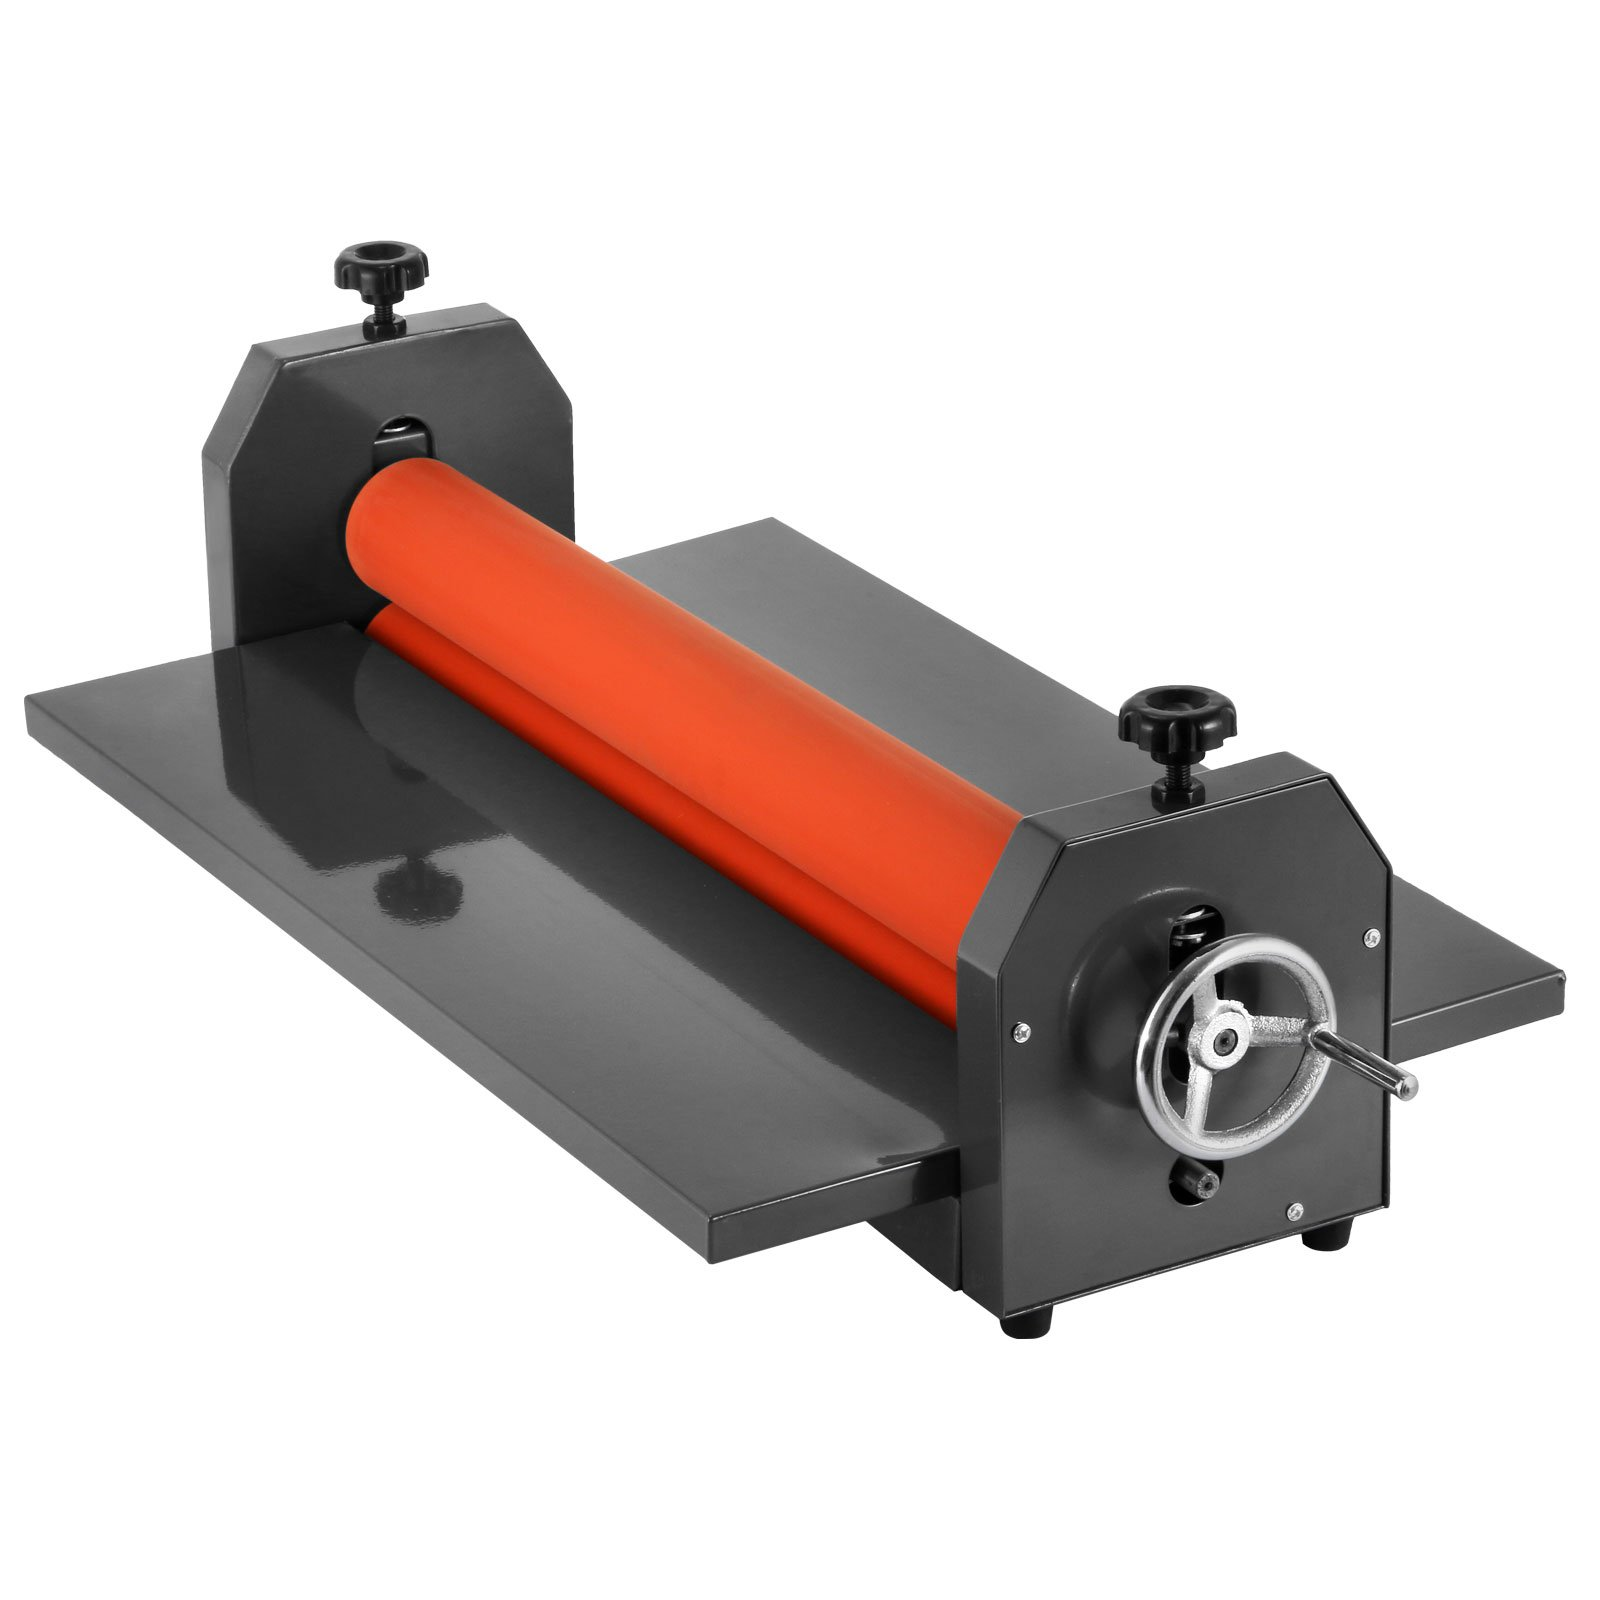 OrangeA Cold Laminator Roll Laminator Cold Laminating Machine 39 Inch 4 Roller System Manual Vinyl Photo Film(39 Inch)